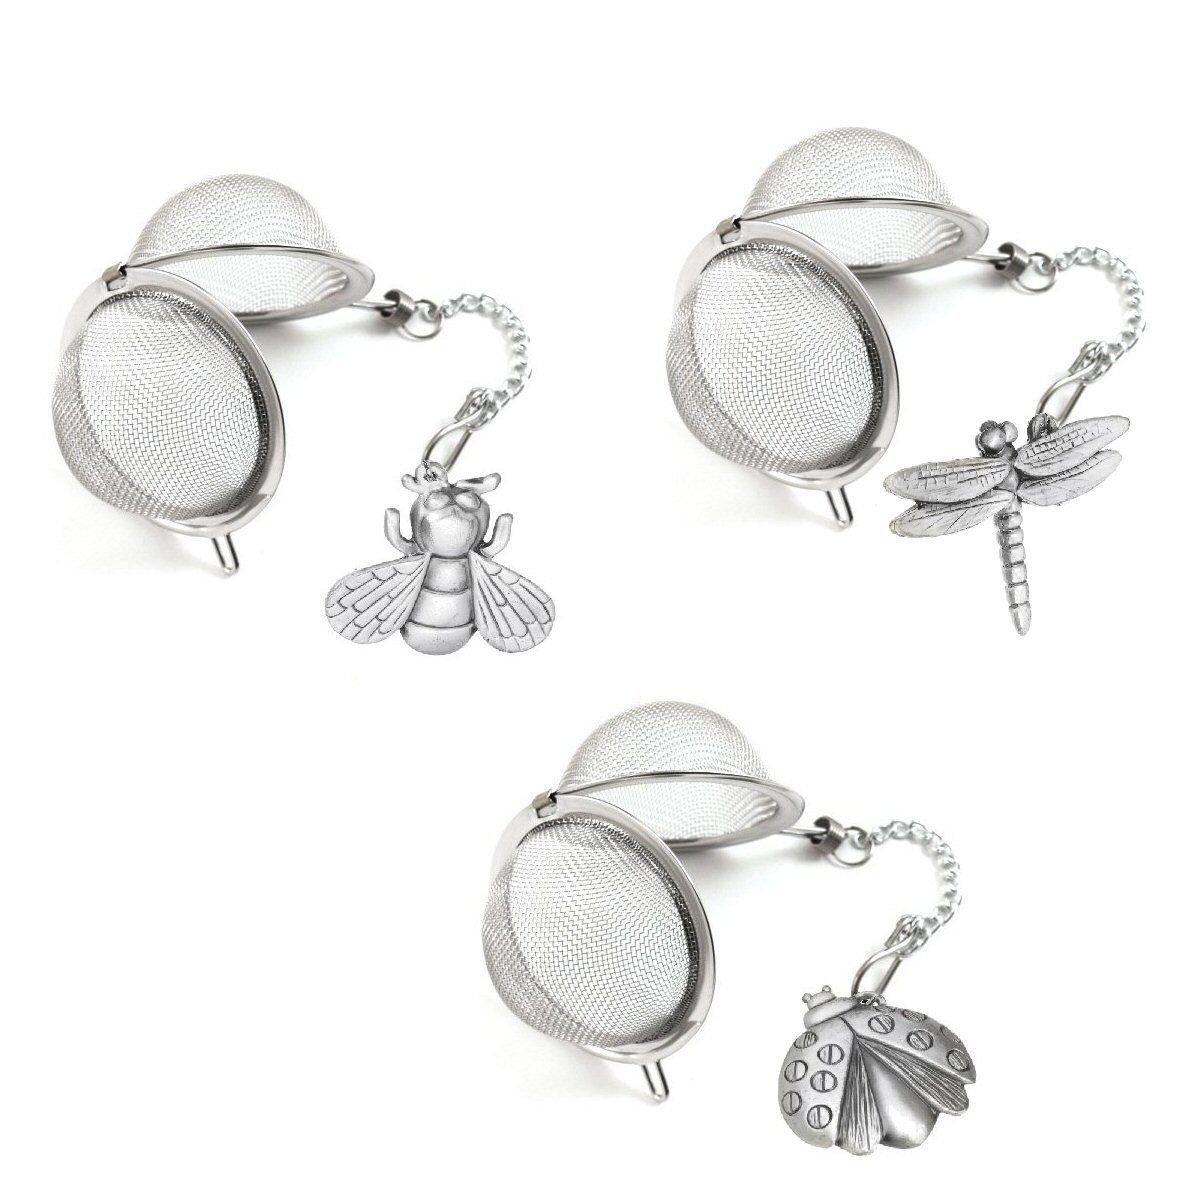 Prodyne Garden Dwellers Stainless Steel Tea Infuser (LadyBug)